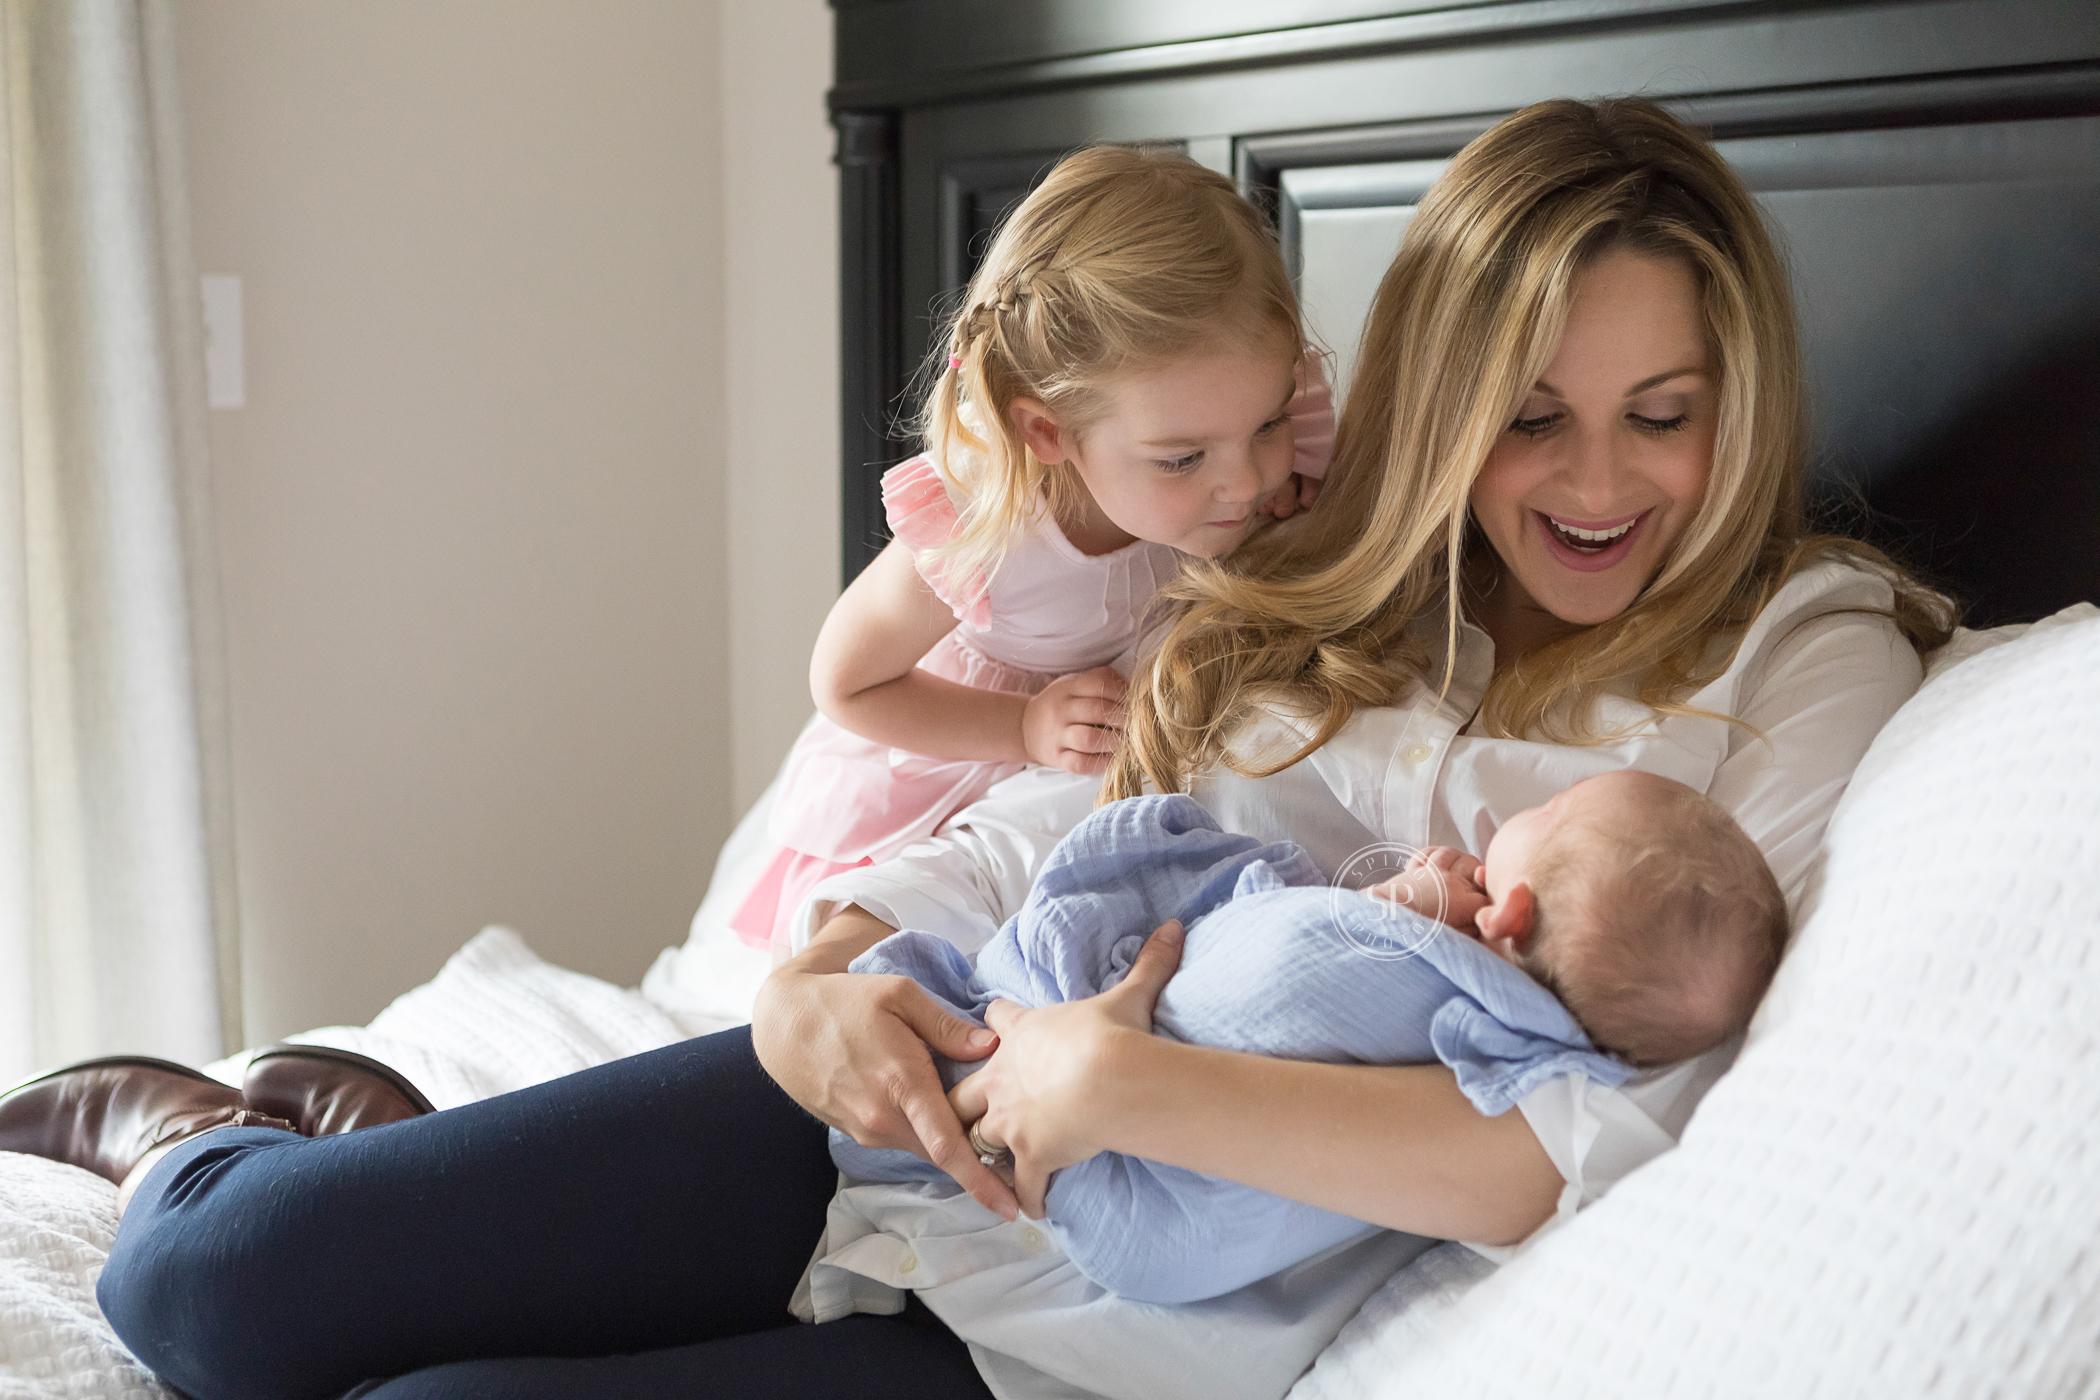 newborn-spino-photo-baby-photography-family-walnut-creek